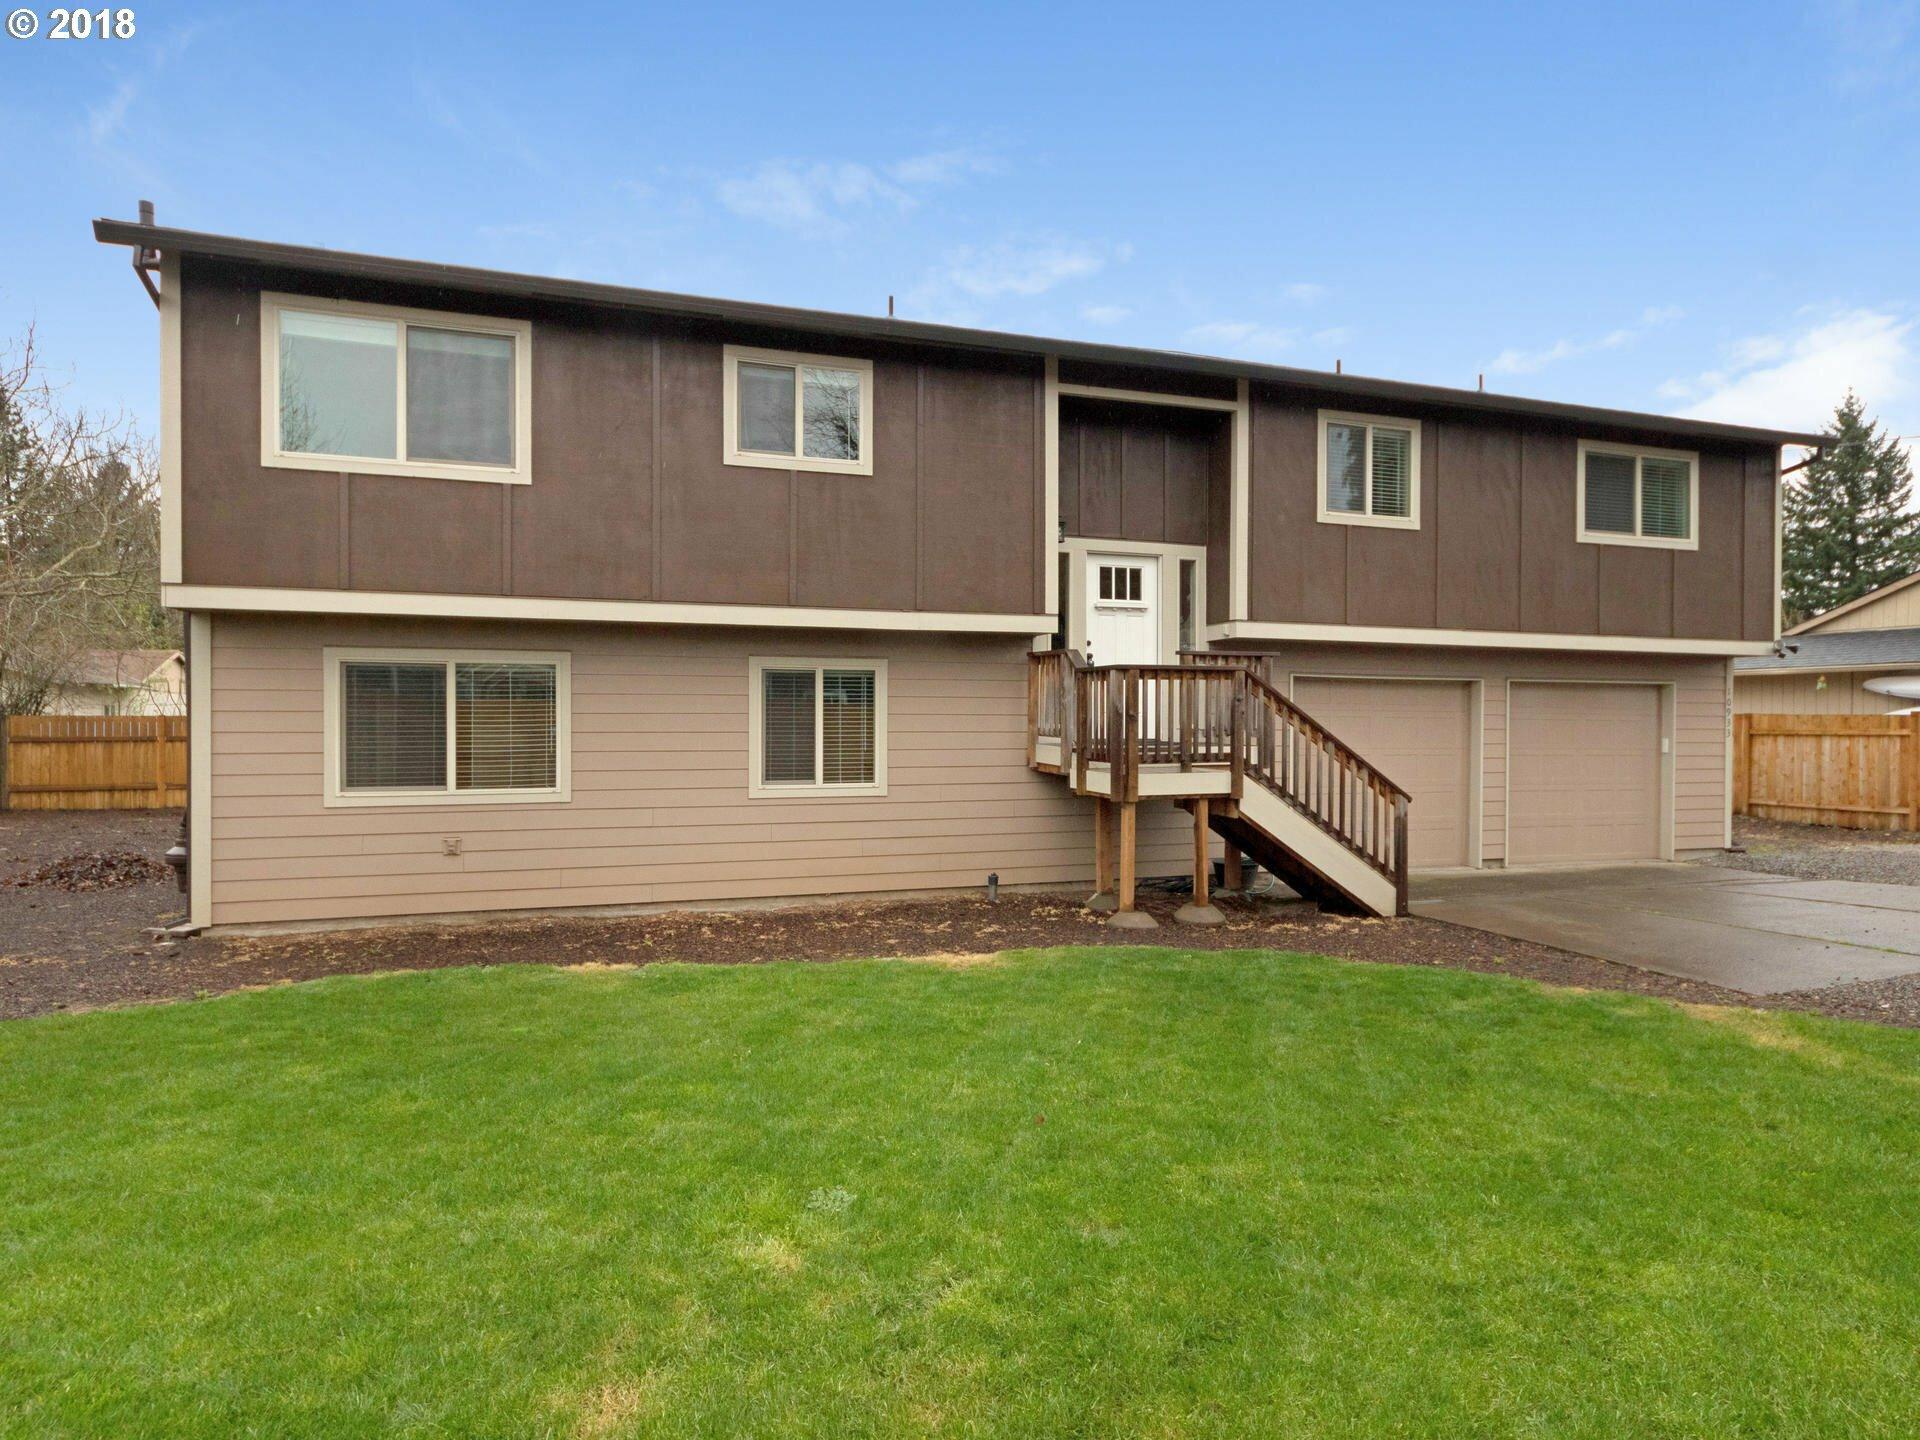 10933 Ne Morris St, Portland, OR - USA (photo 1)